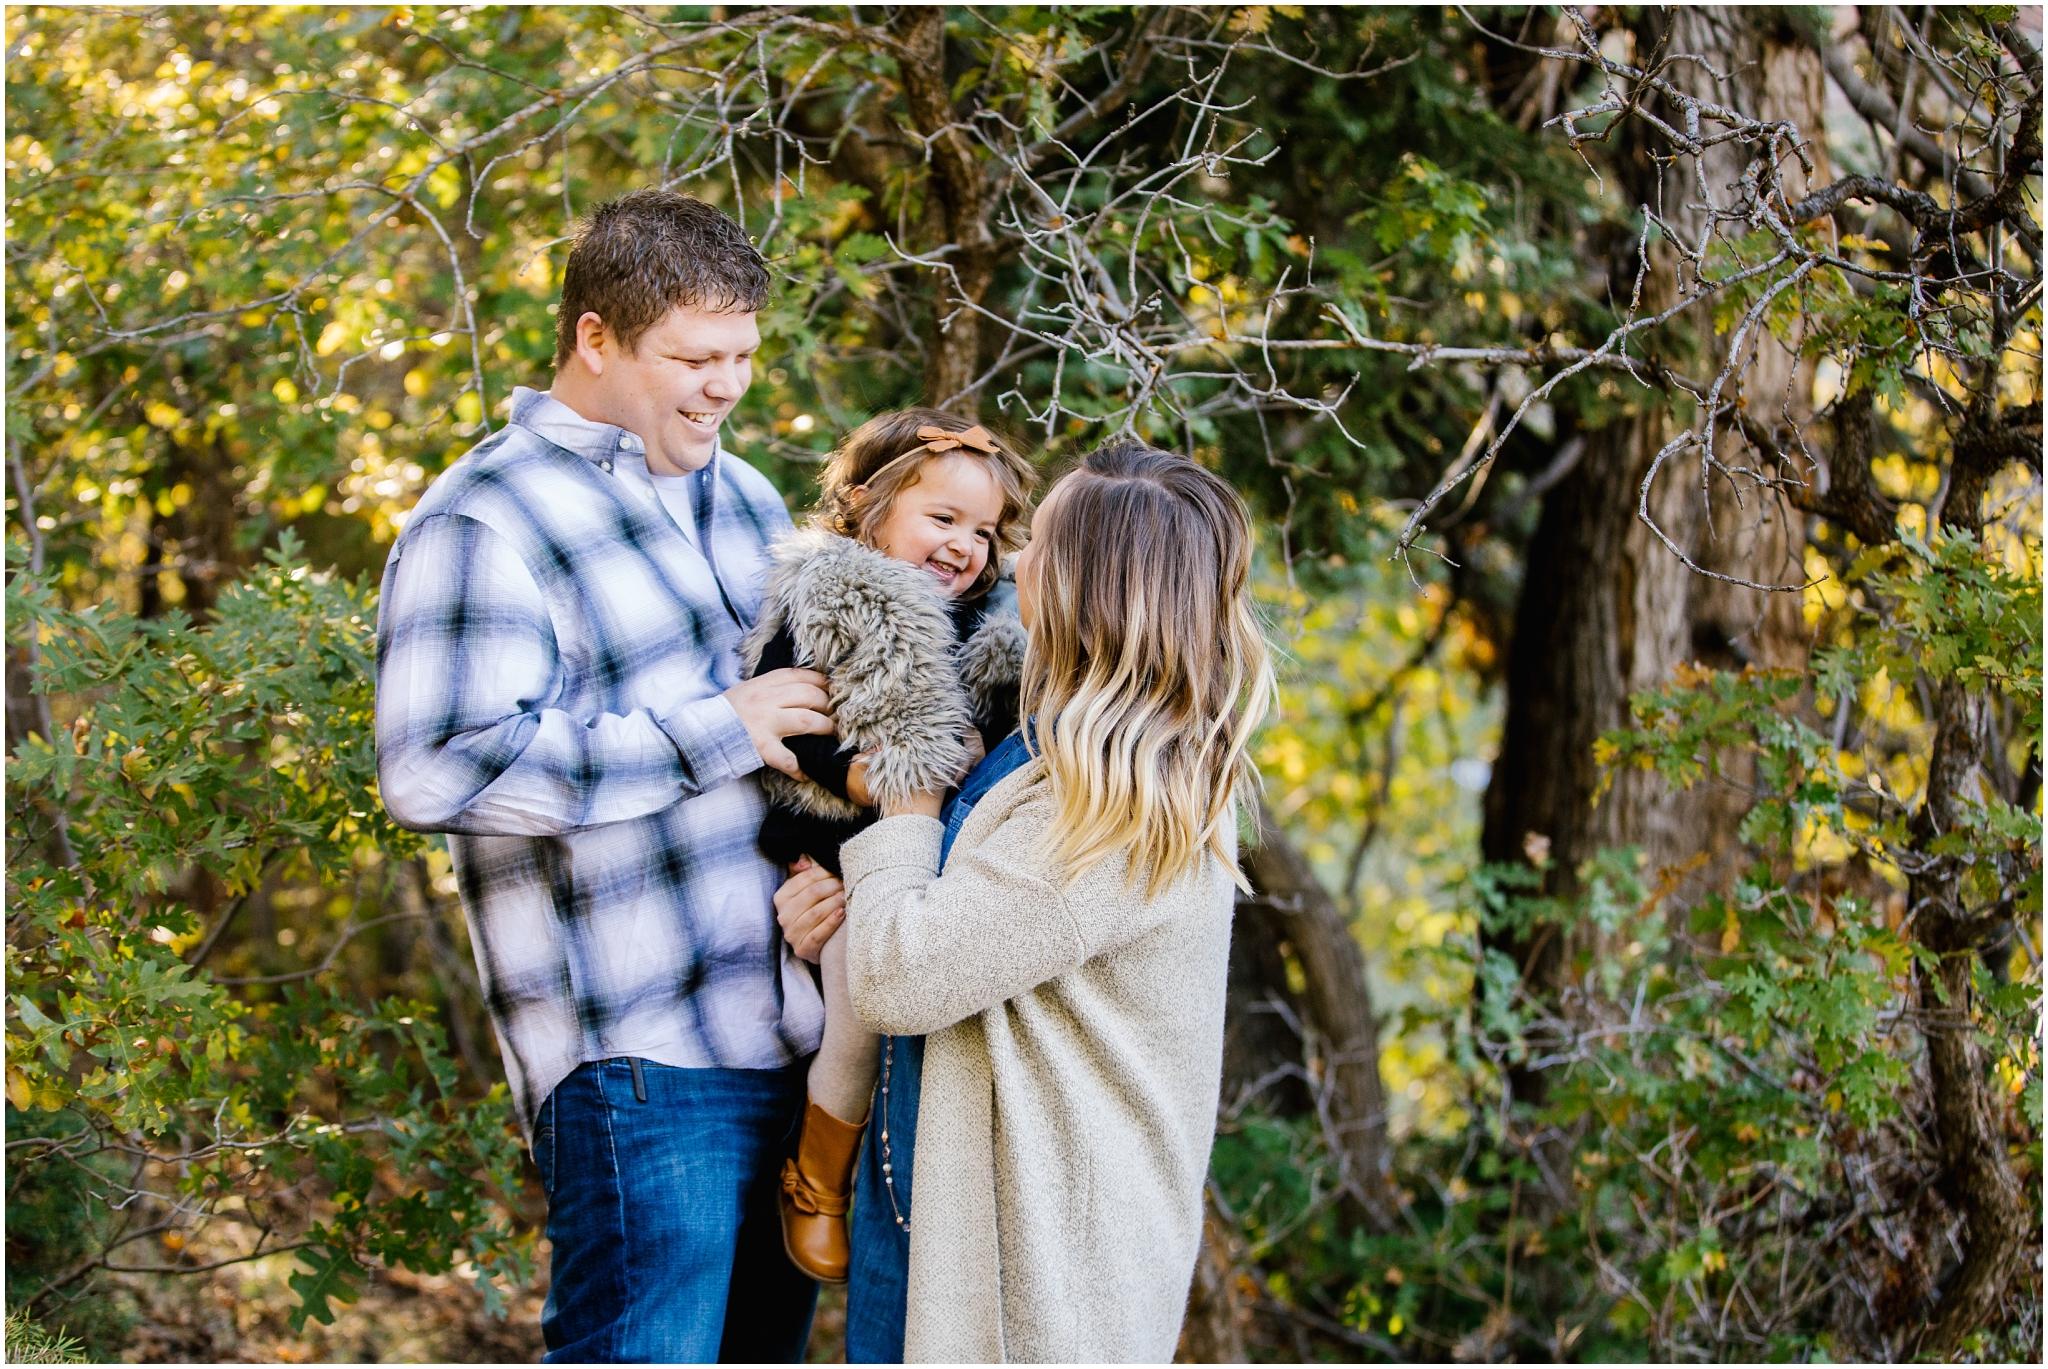 Frandsen-5_Lizzie-B-Imagery-Utah-Family-Photographer-Utah-County-Central-Utah-Park-City-Salt-Lake-City.jpg